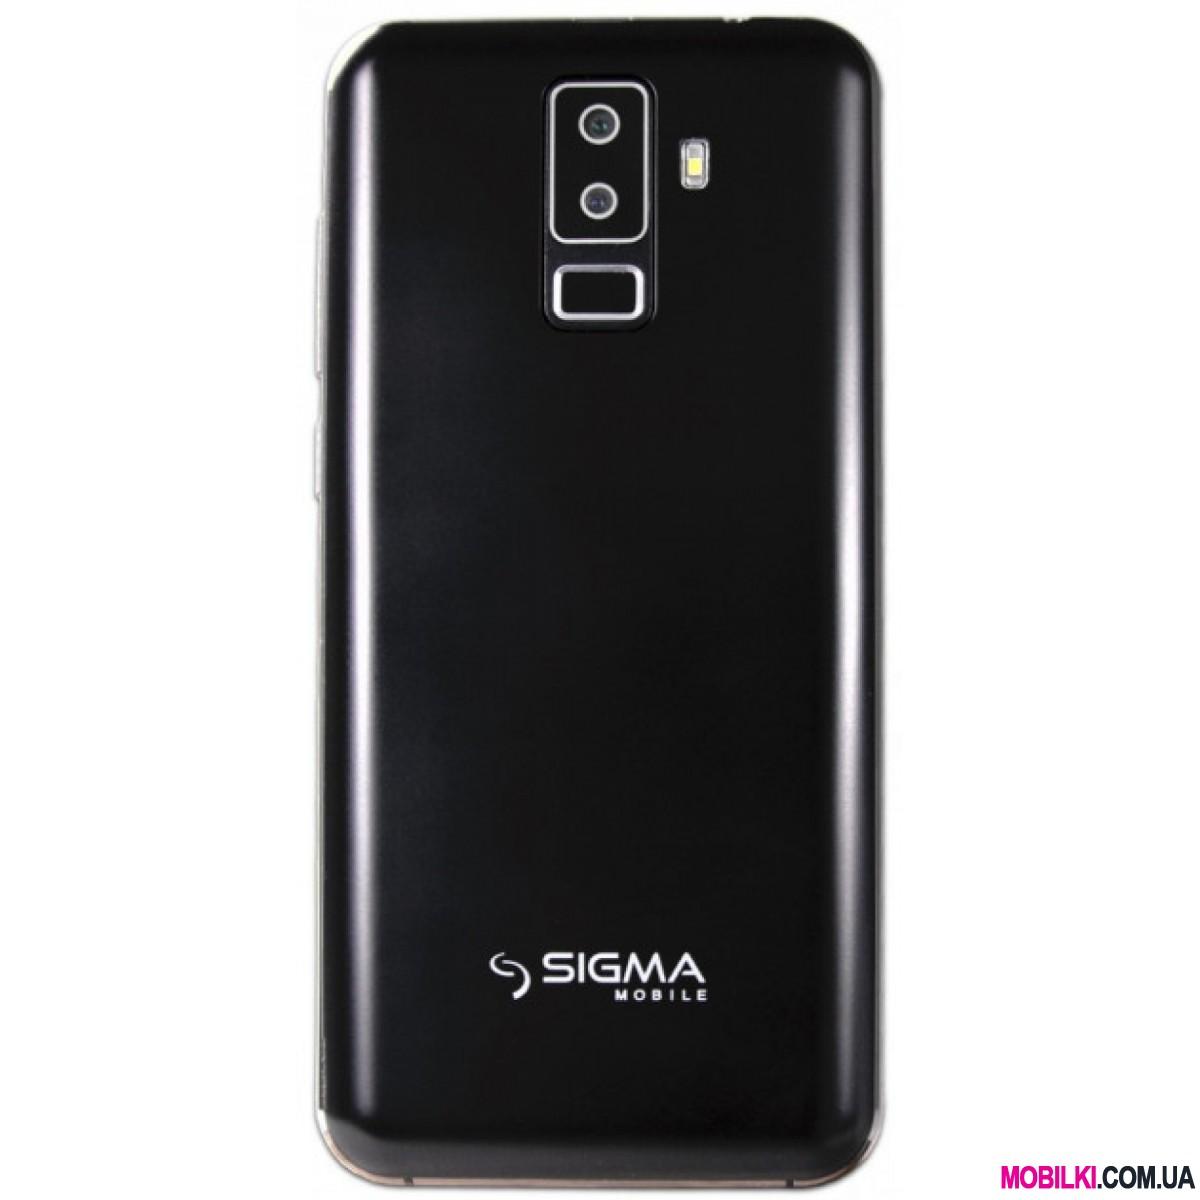 Sigma mobile X-style S5501 Black 4G